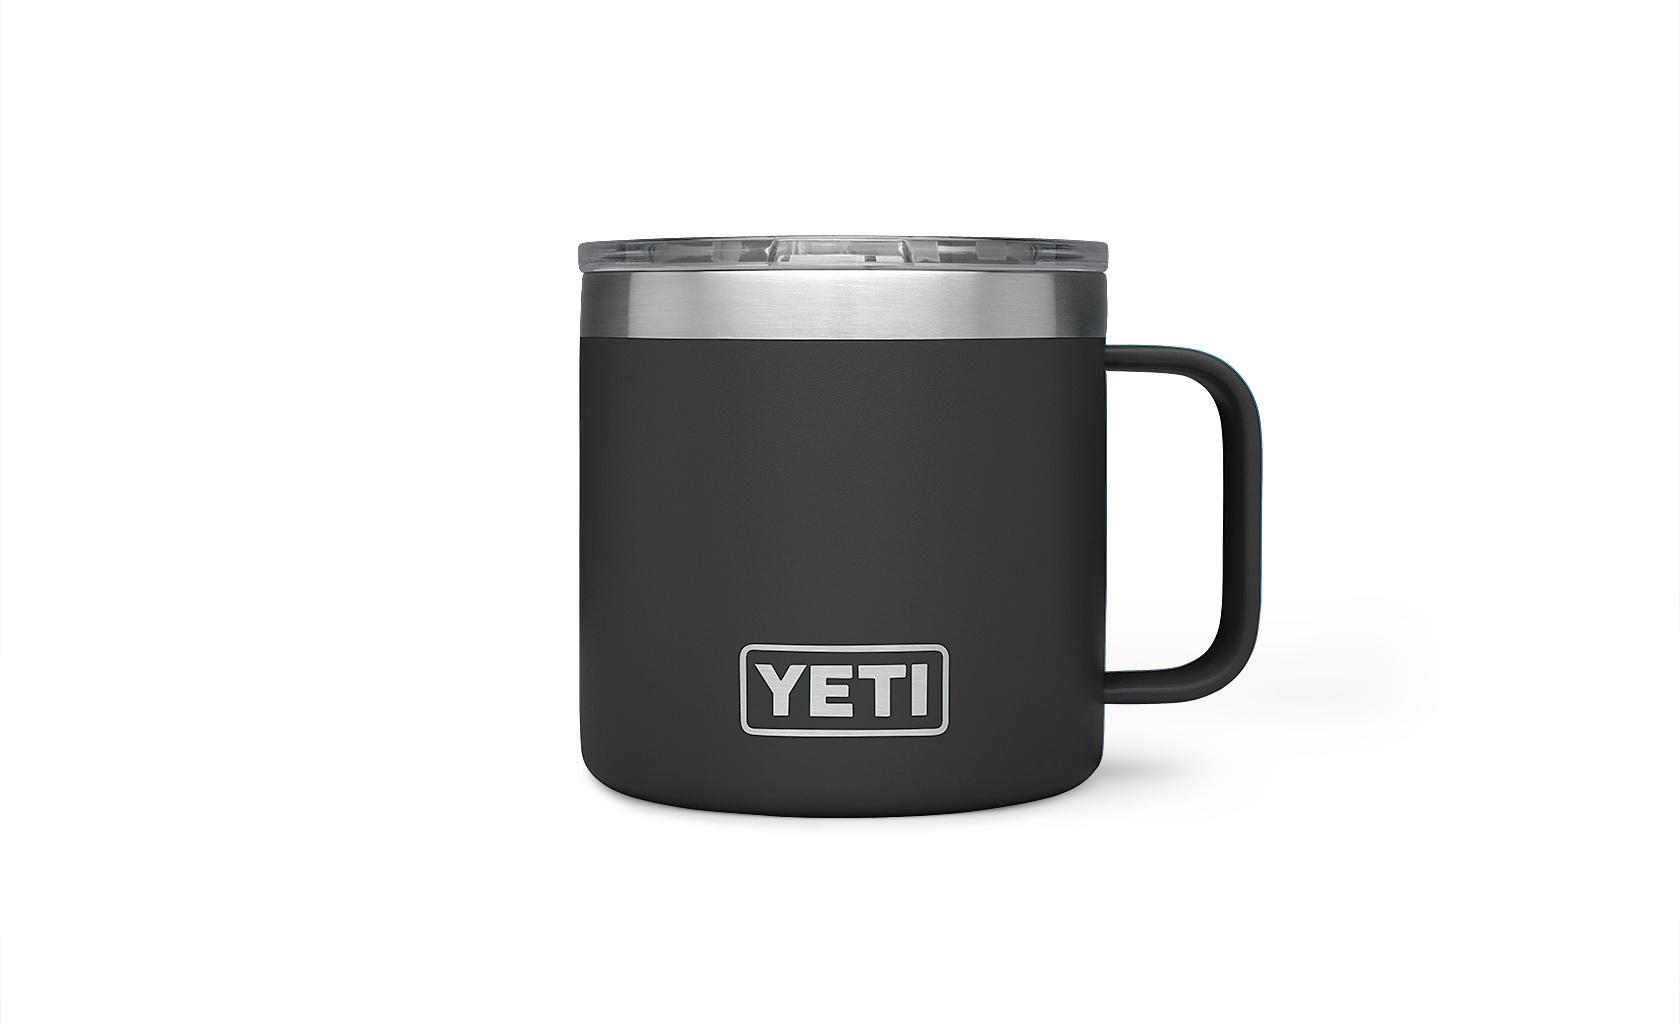 Yeti 14 oz mug black